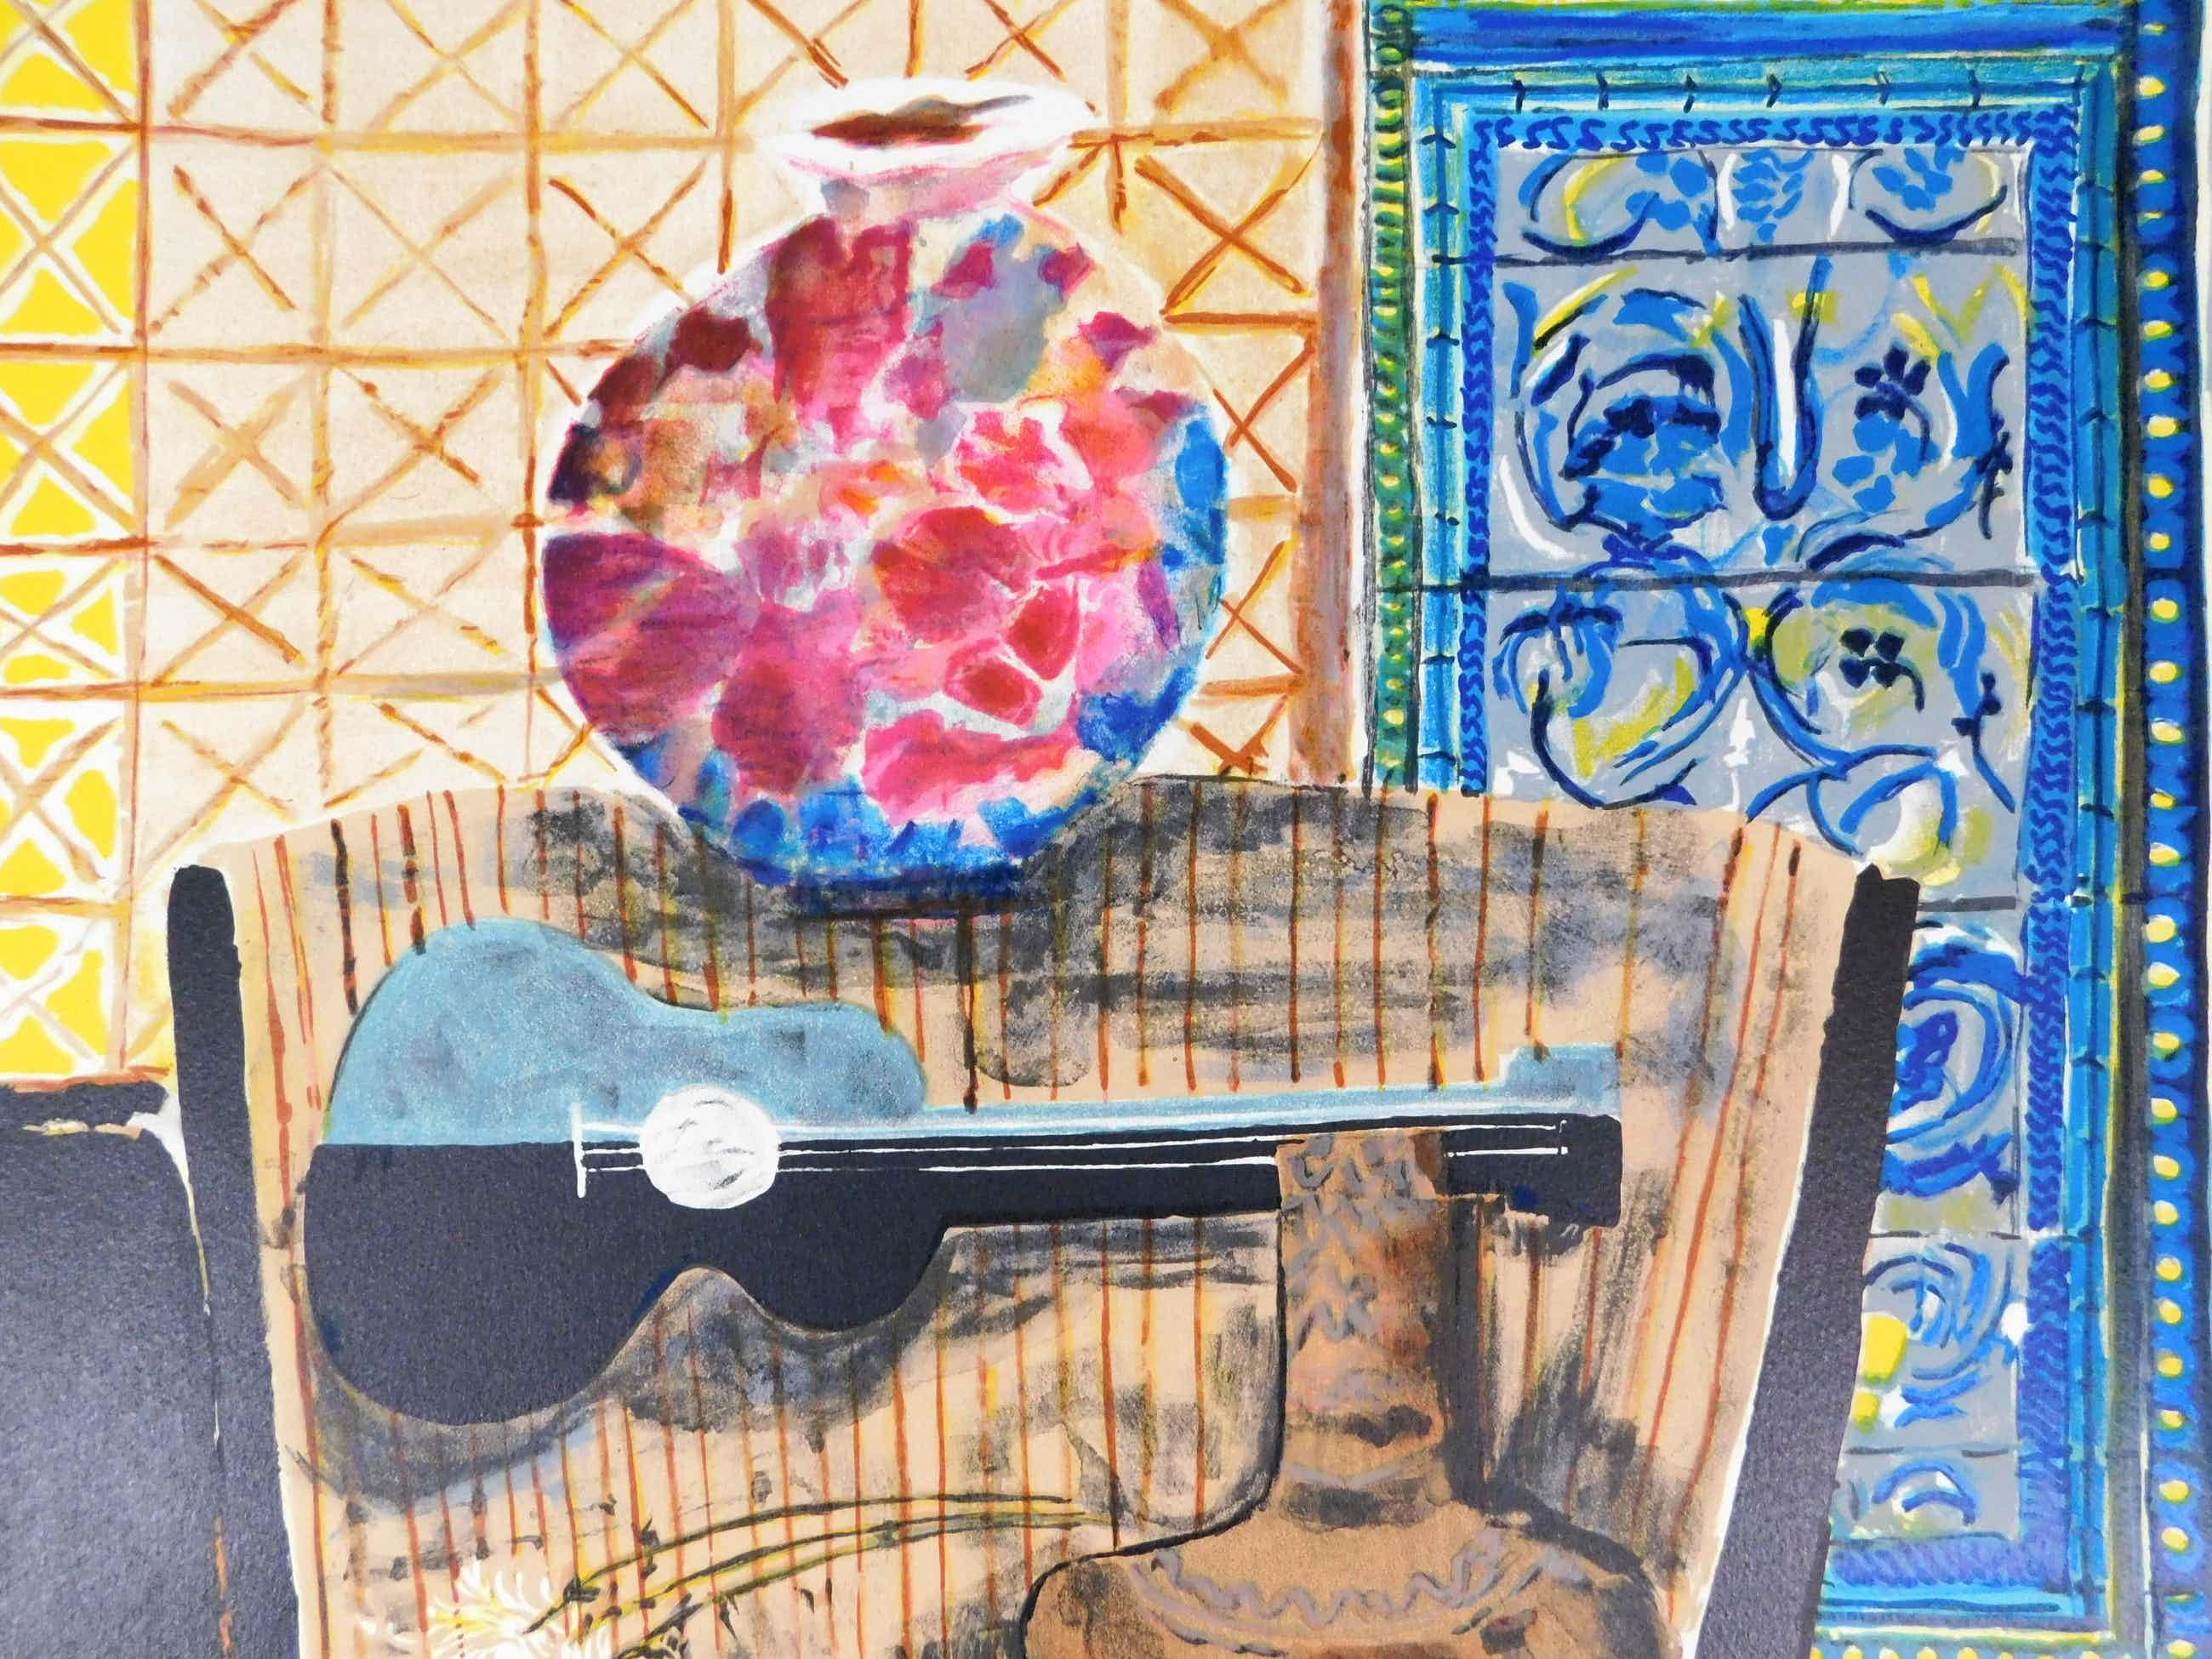 Wendy Chazin - Composition with Guitar and Vase kopen? Bied vanaf 40!